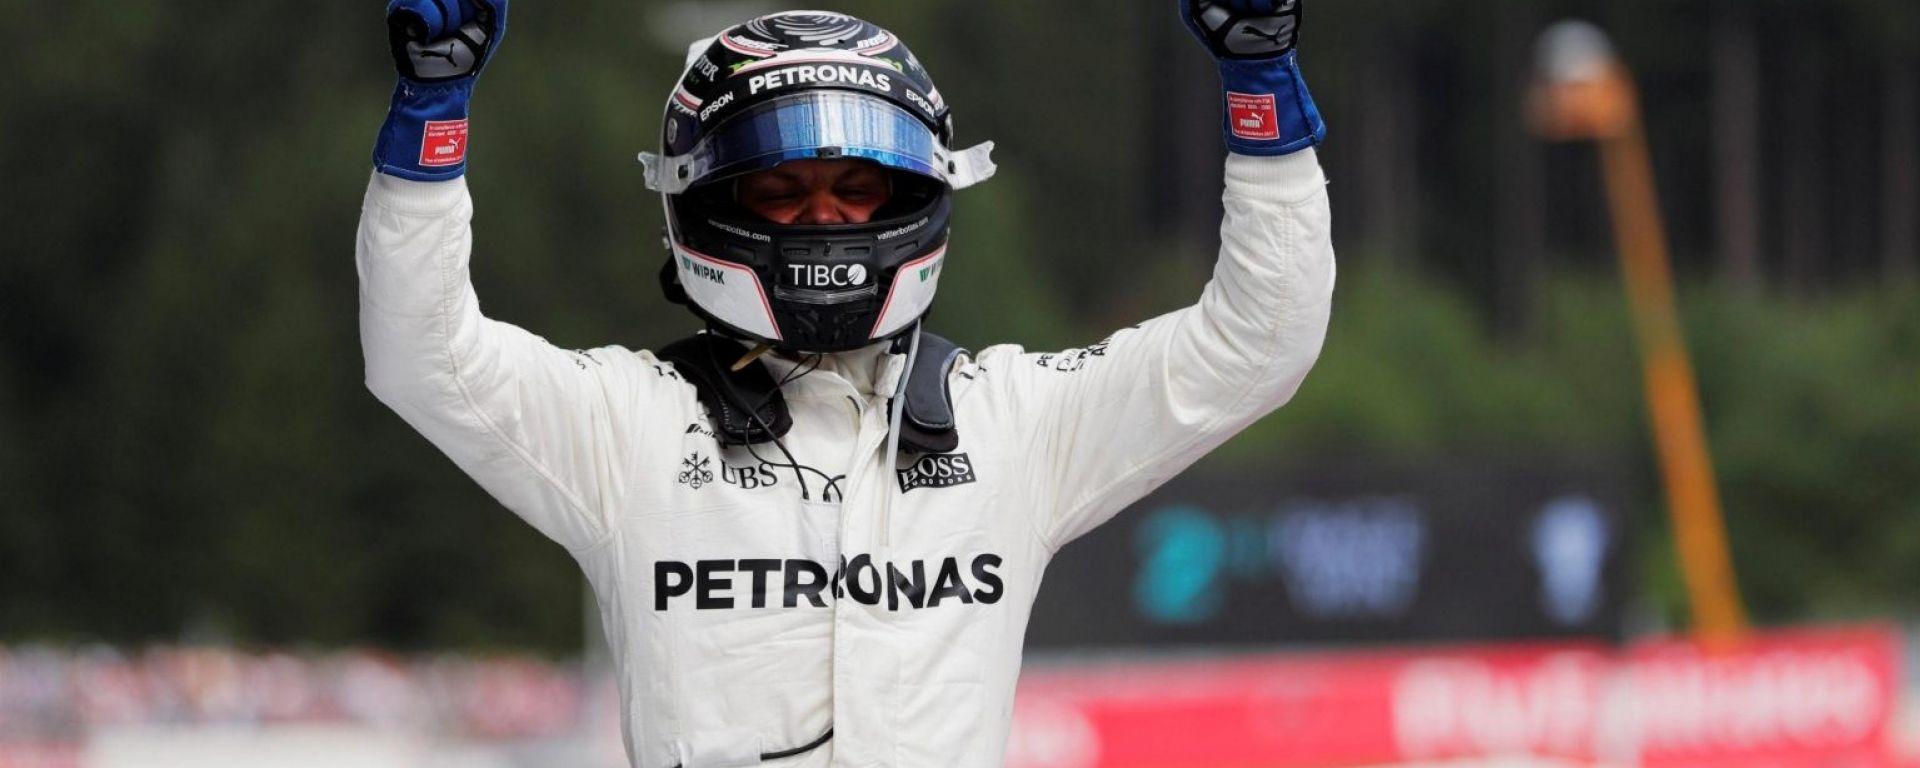 F1 2017 GP Austria